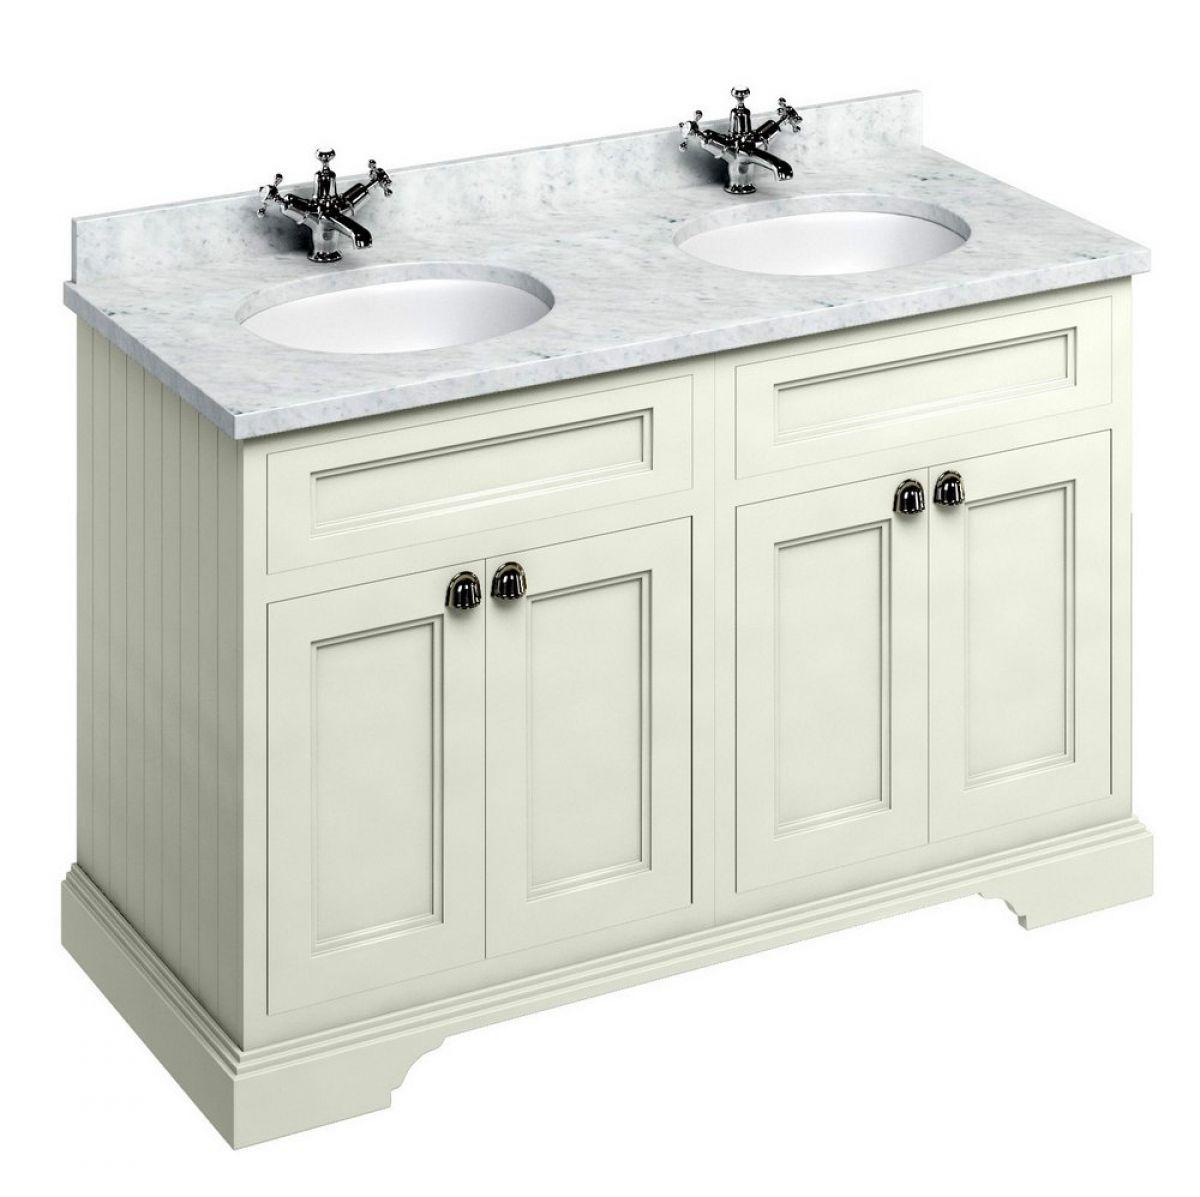 Bathroom sink and vanity unit -  Burlington 130 Twin Basin Vanity Unit With Four Doors